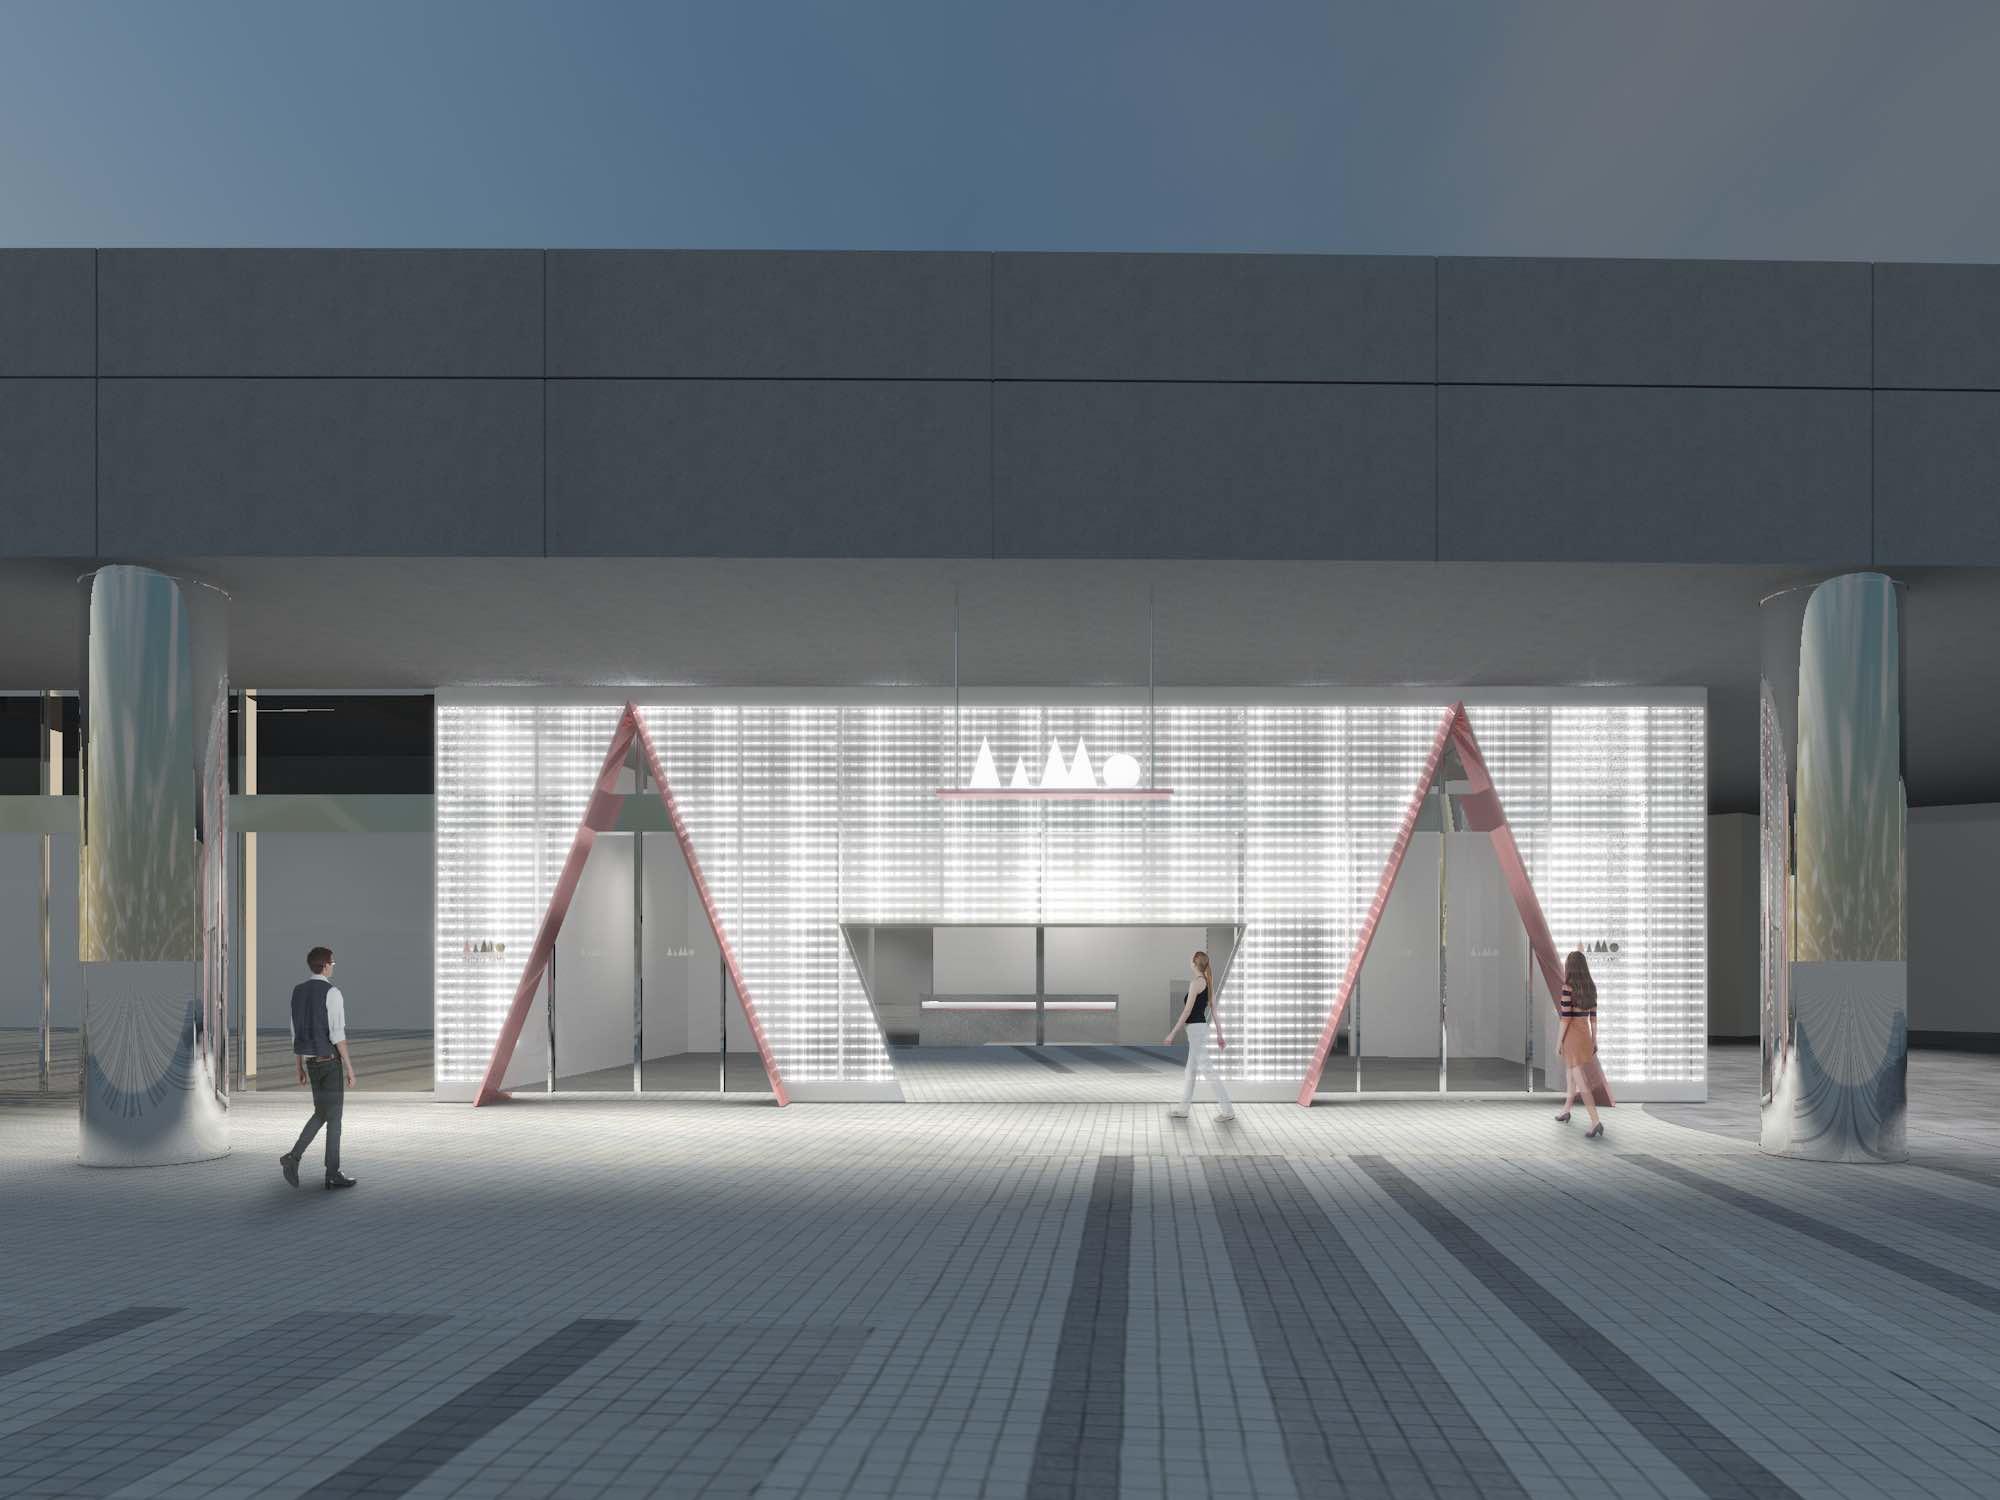 【EVENT】東京が丸ごとバーチャルな空間に生まれ変わる?360度体感イベント『TOKYO ART CITY by NAKED』が登場